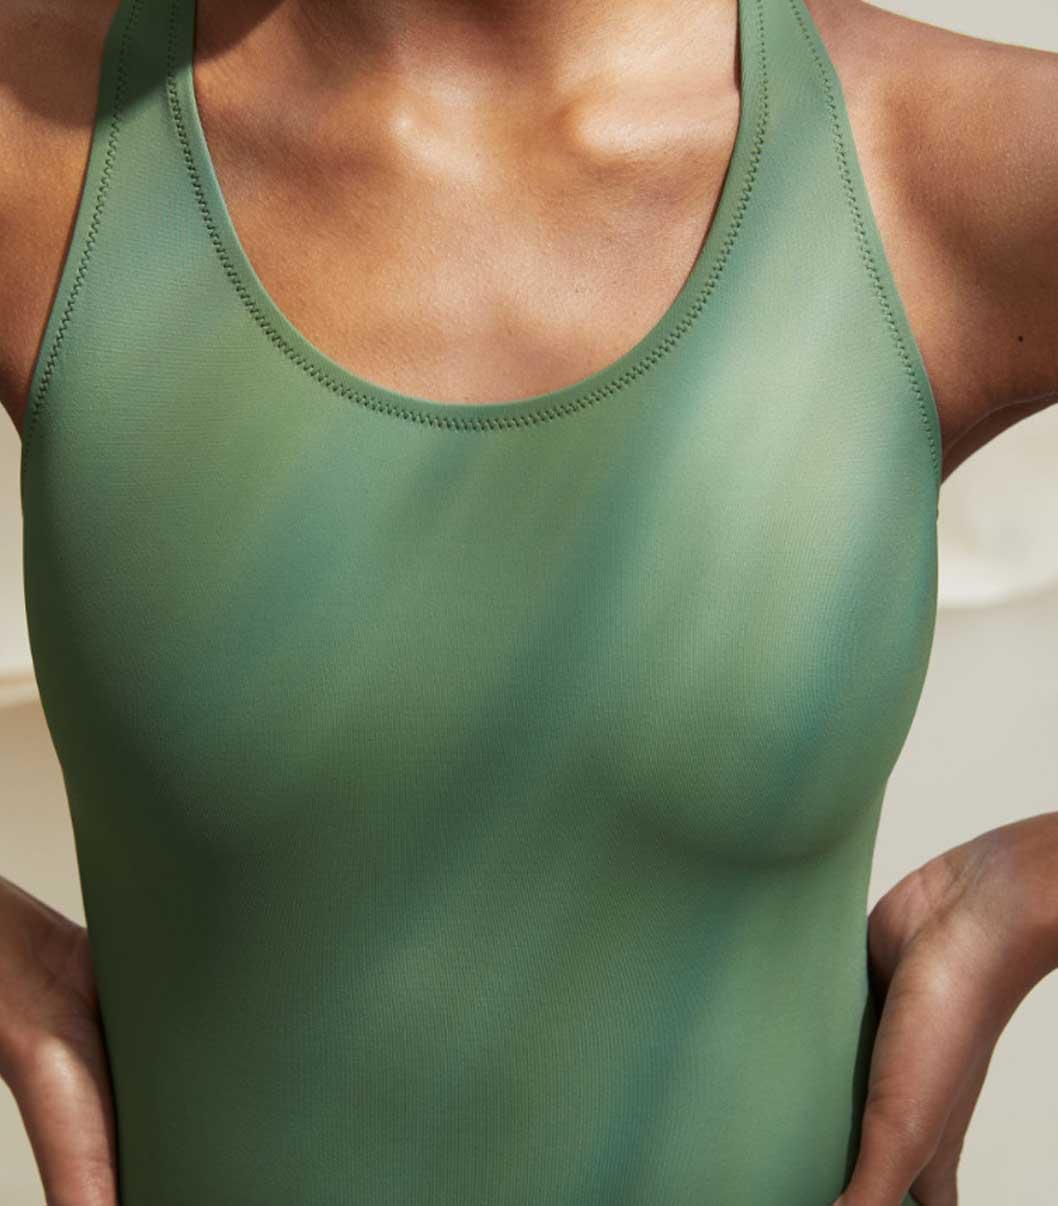 Arket sustainable swim wear brand ARKET Olive one piece eco lookbook